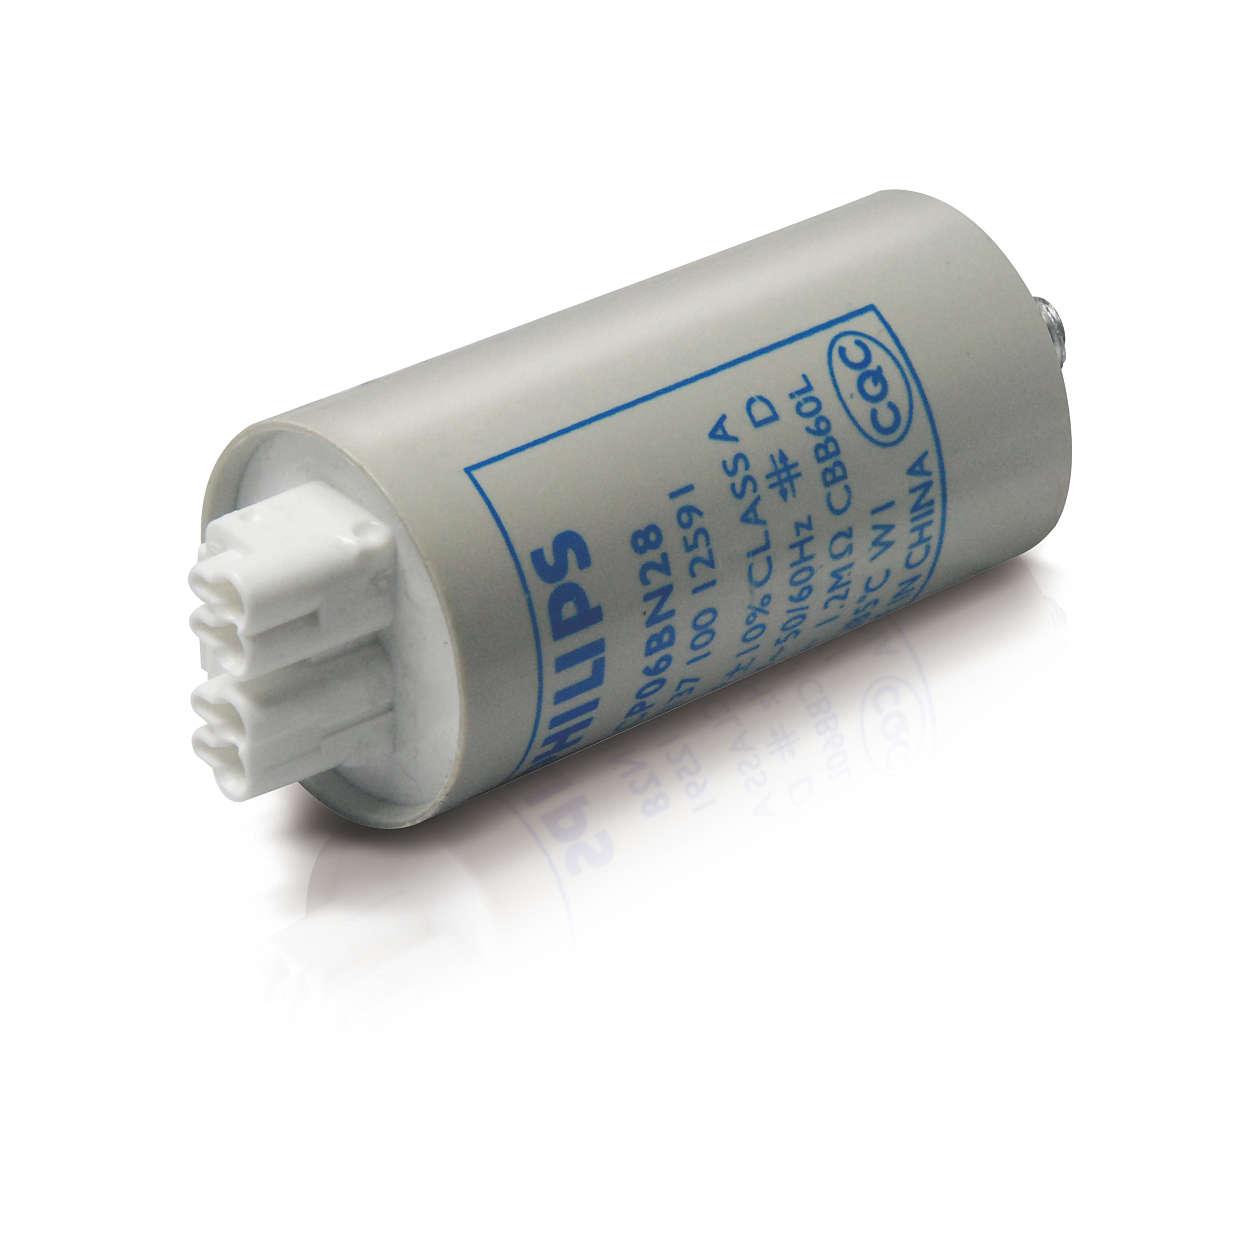 Capacitors for HID lamp circuits